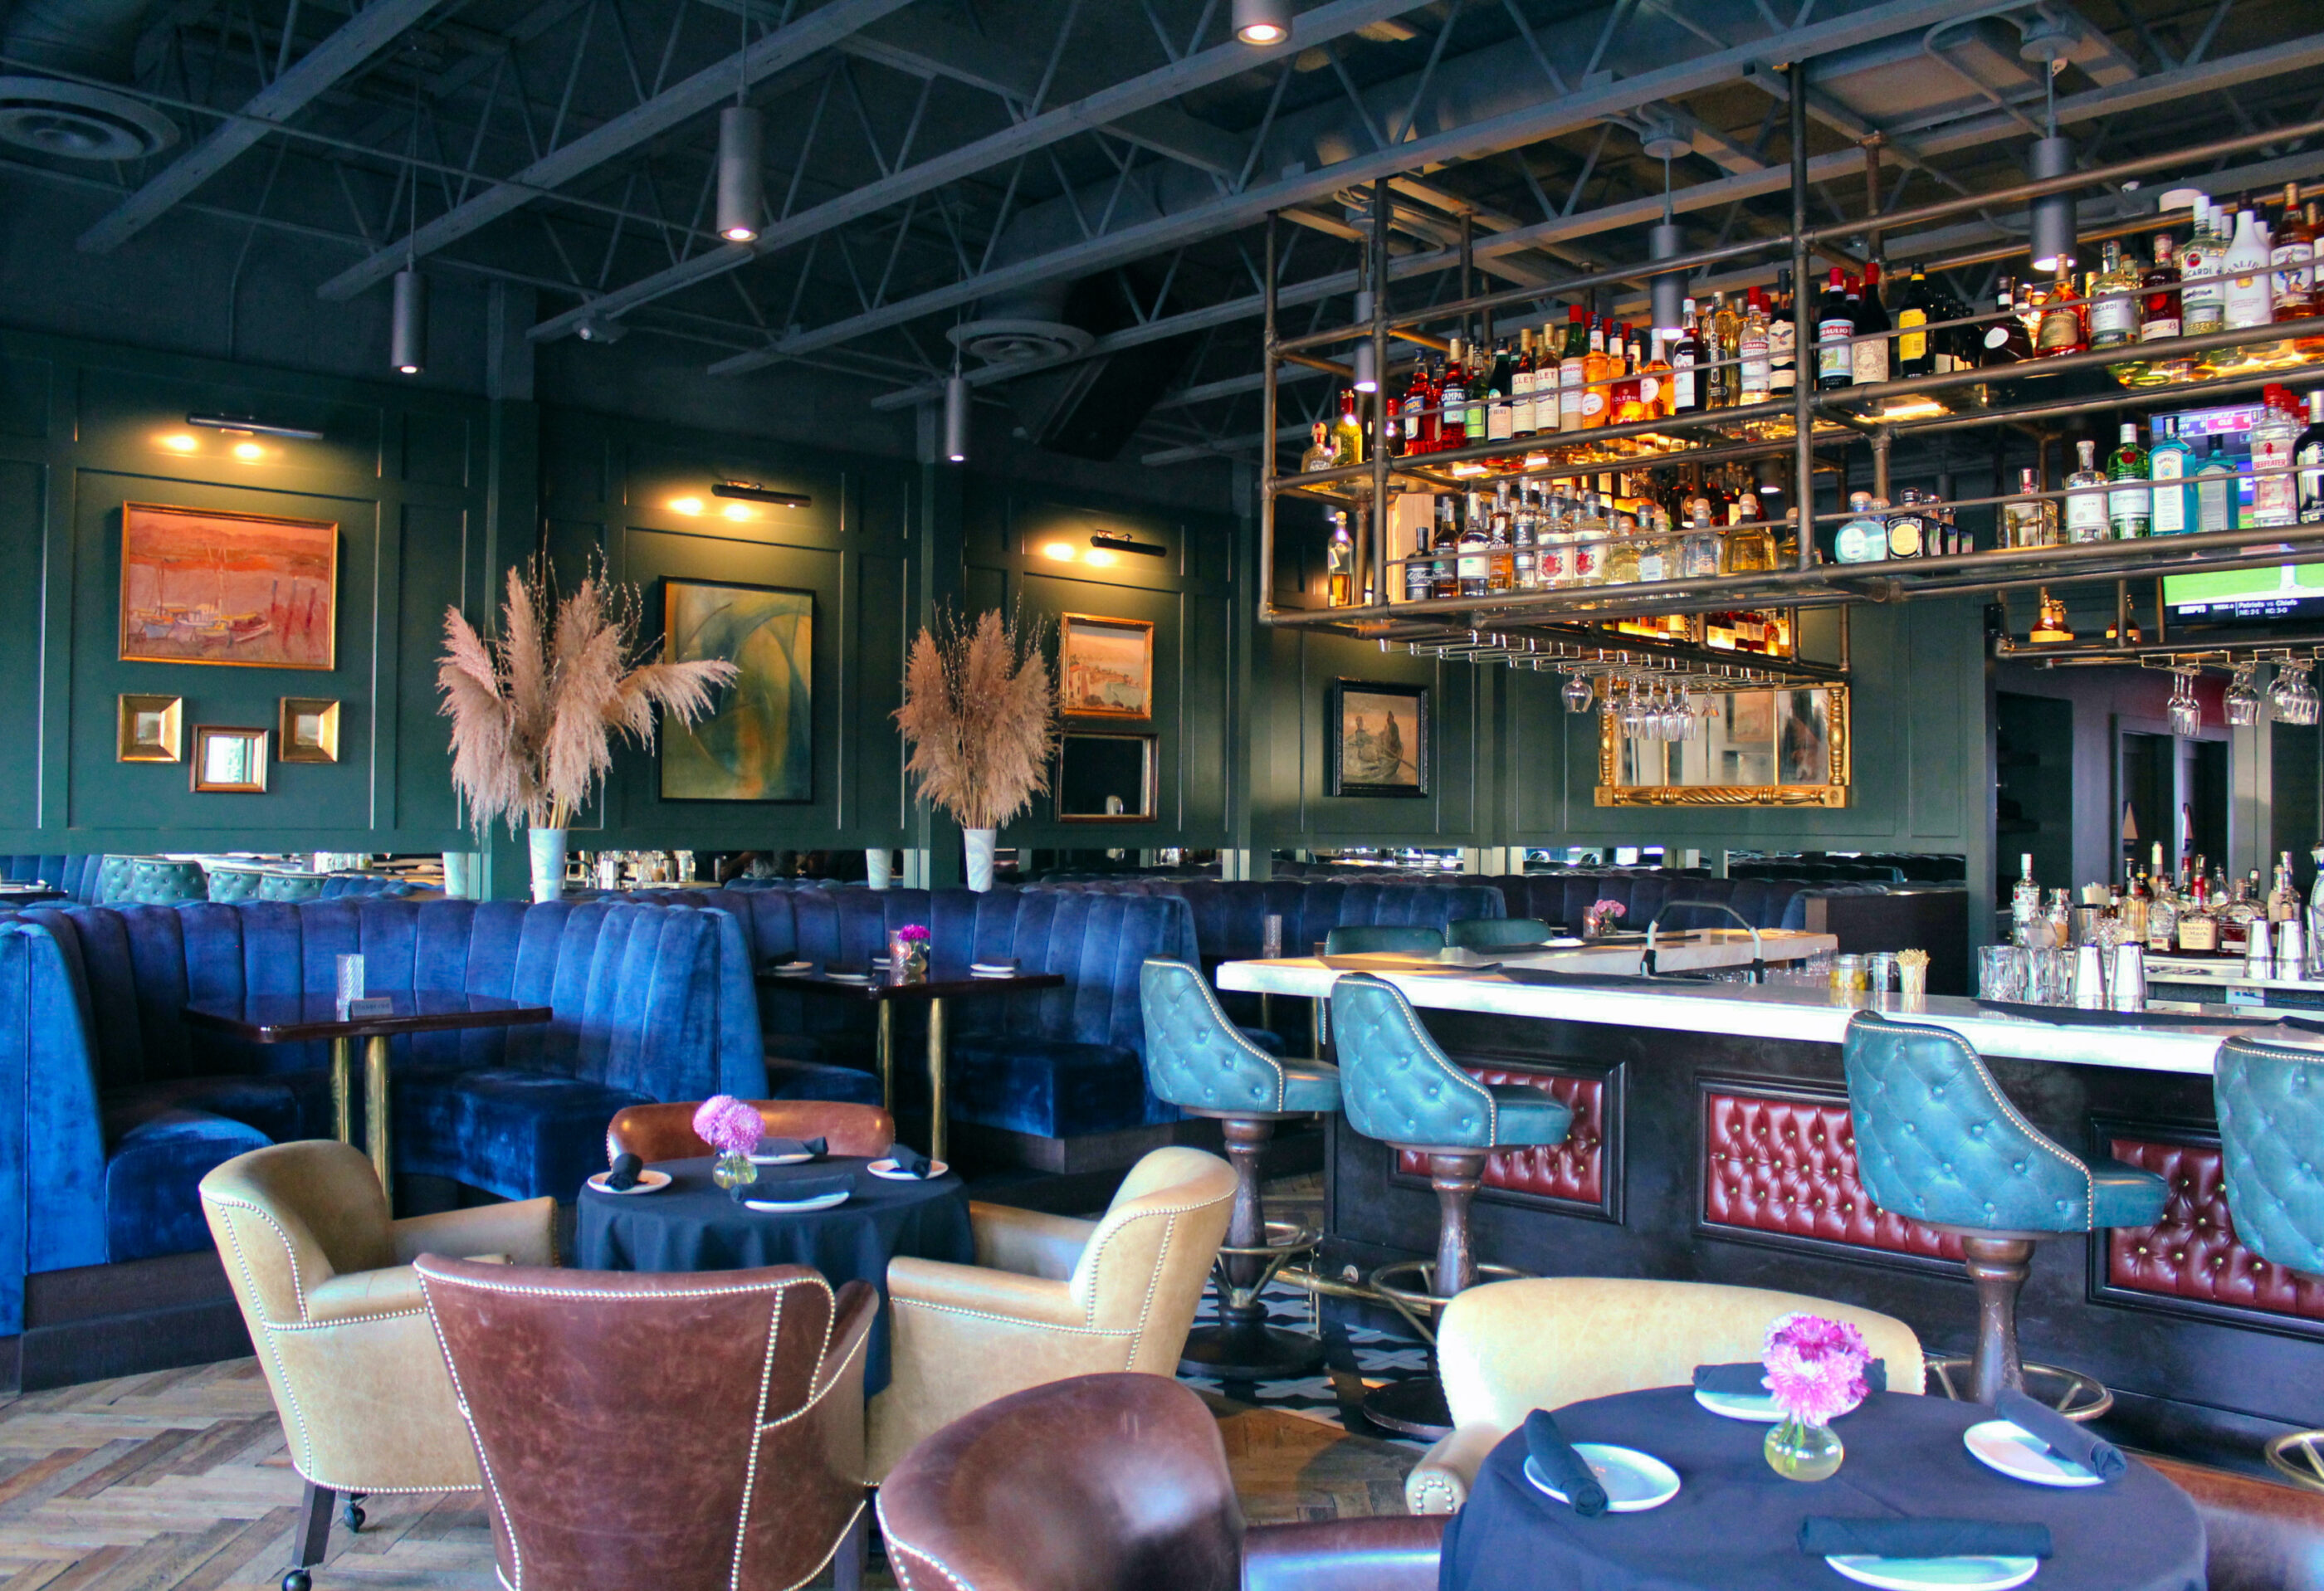 cdm restaurant photo by Brana Designs